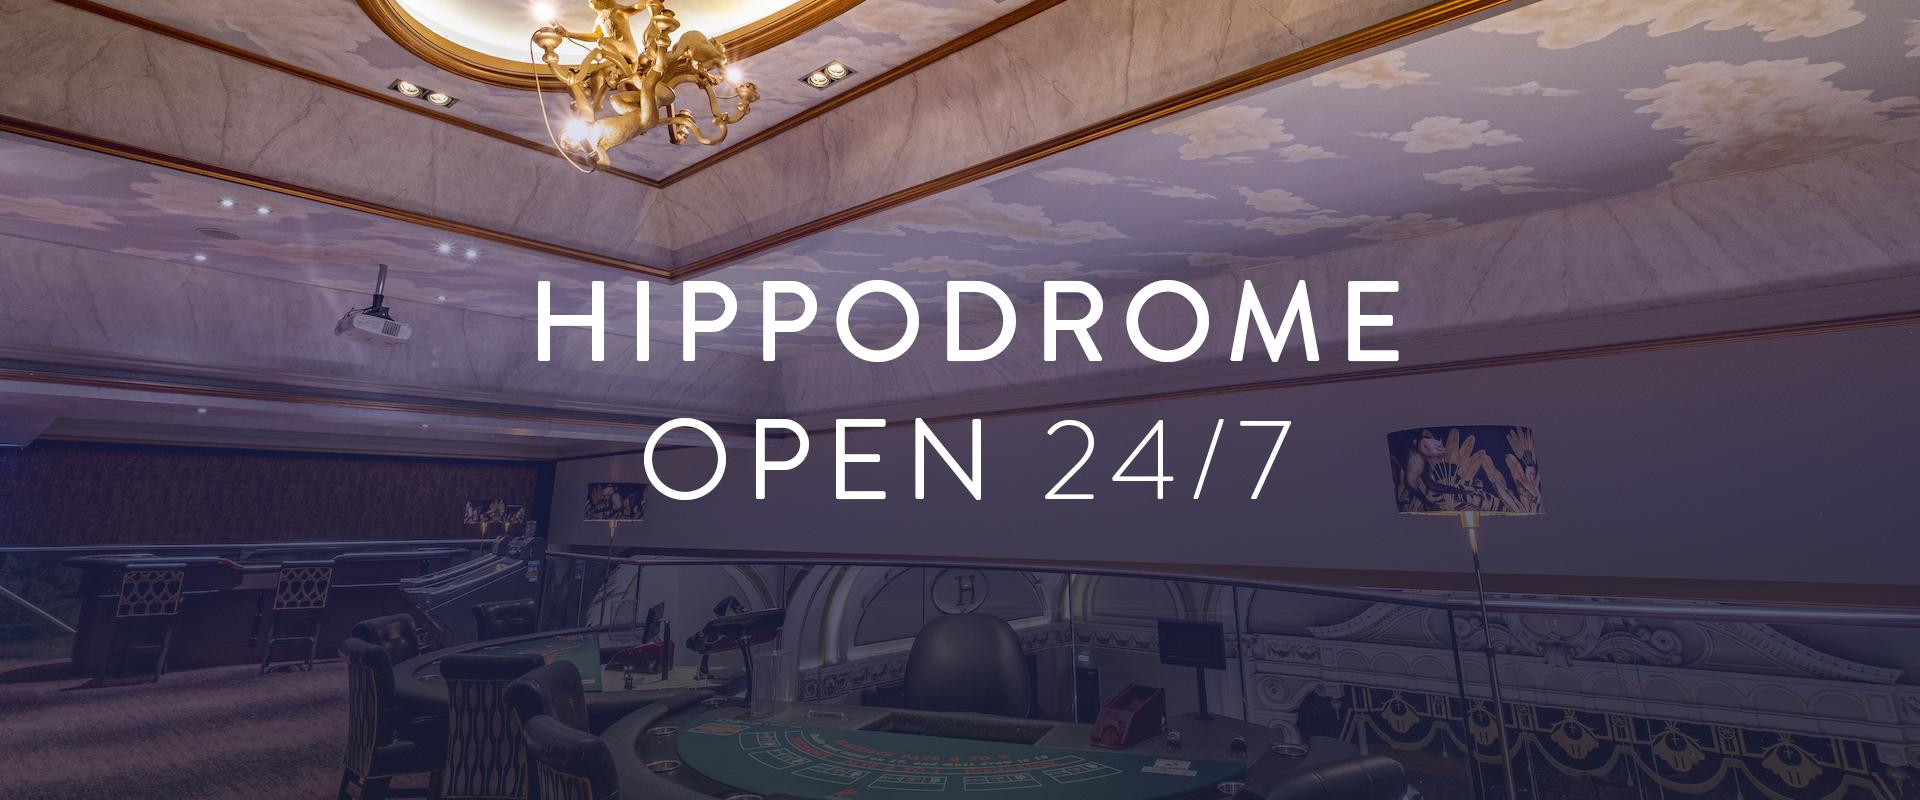 Hippodrome Open